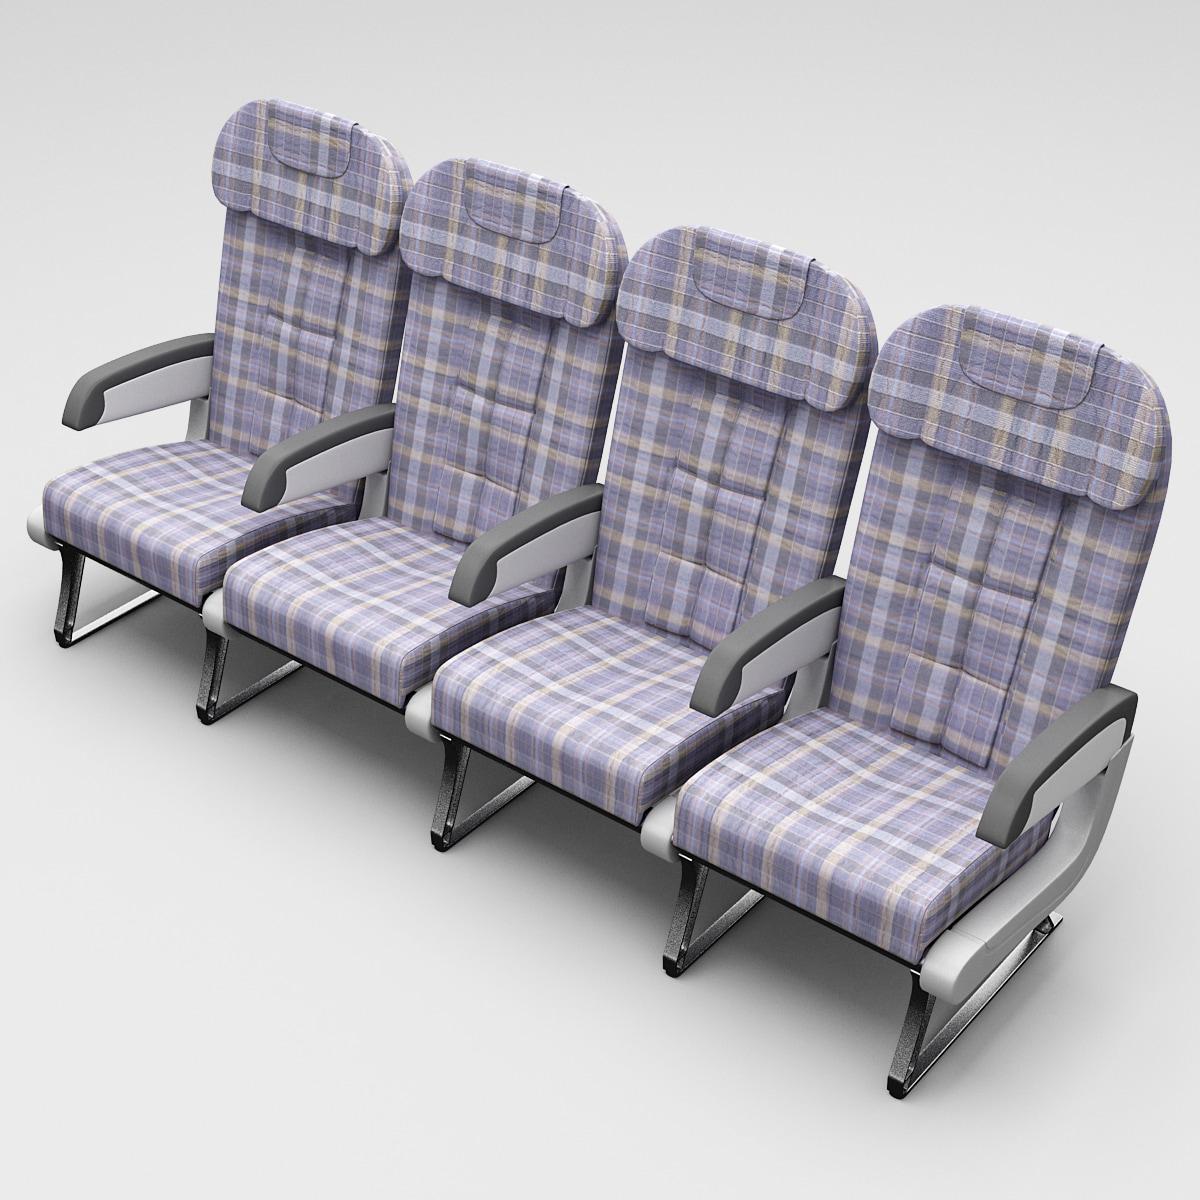 Aircraft_Passenger_Seats_v2_0002.jpg